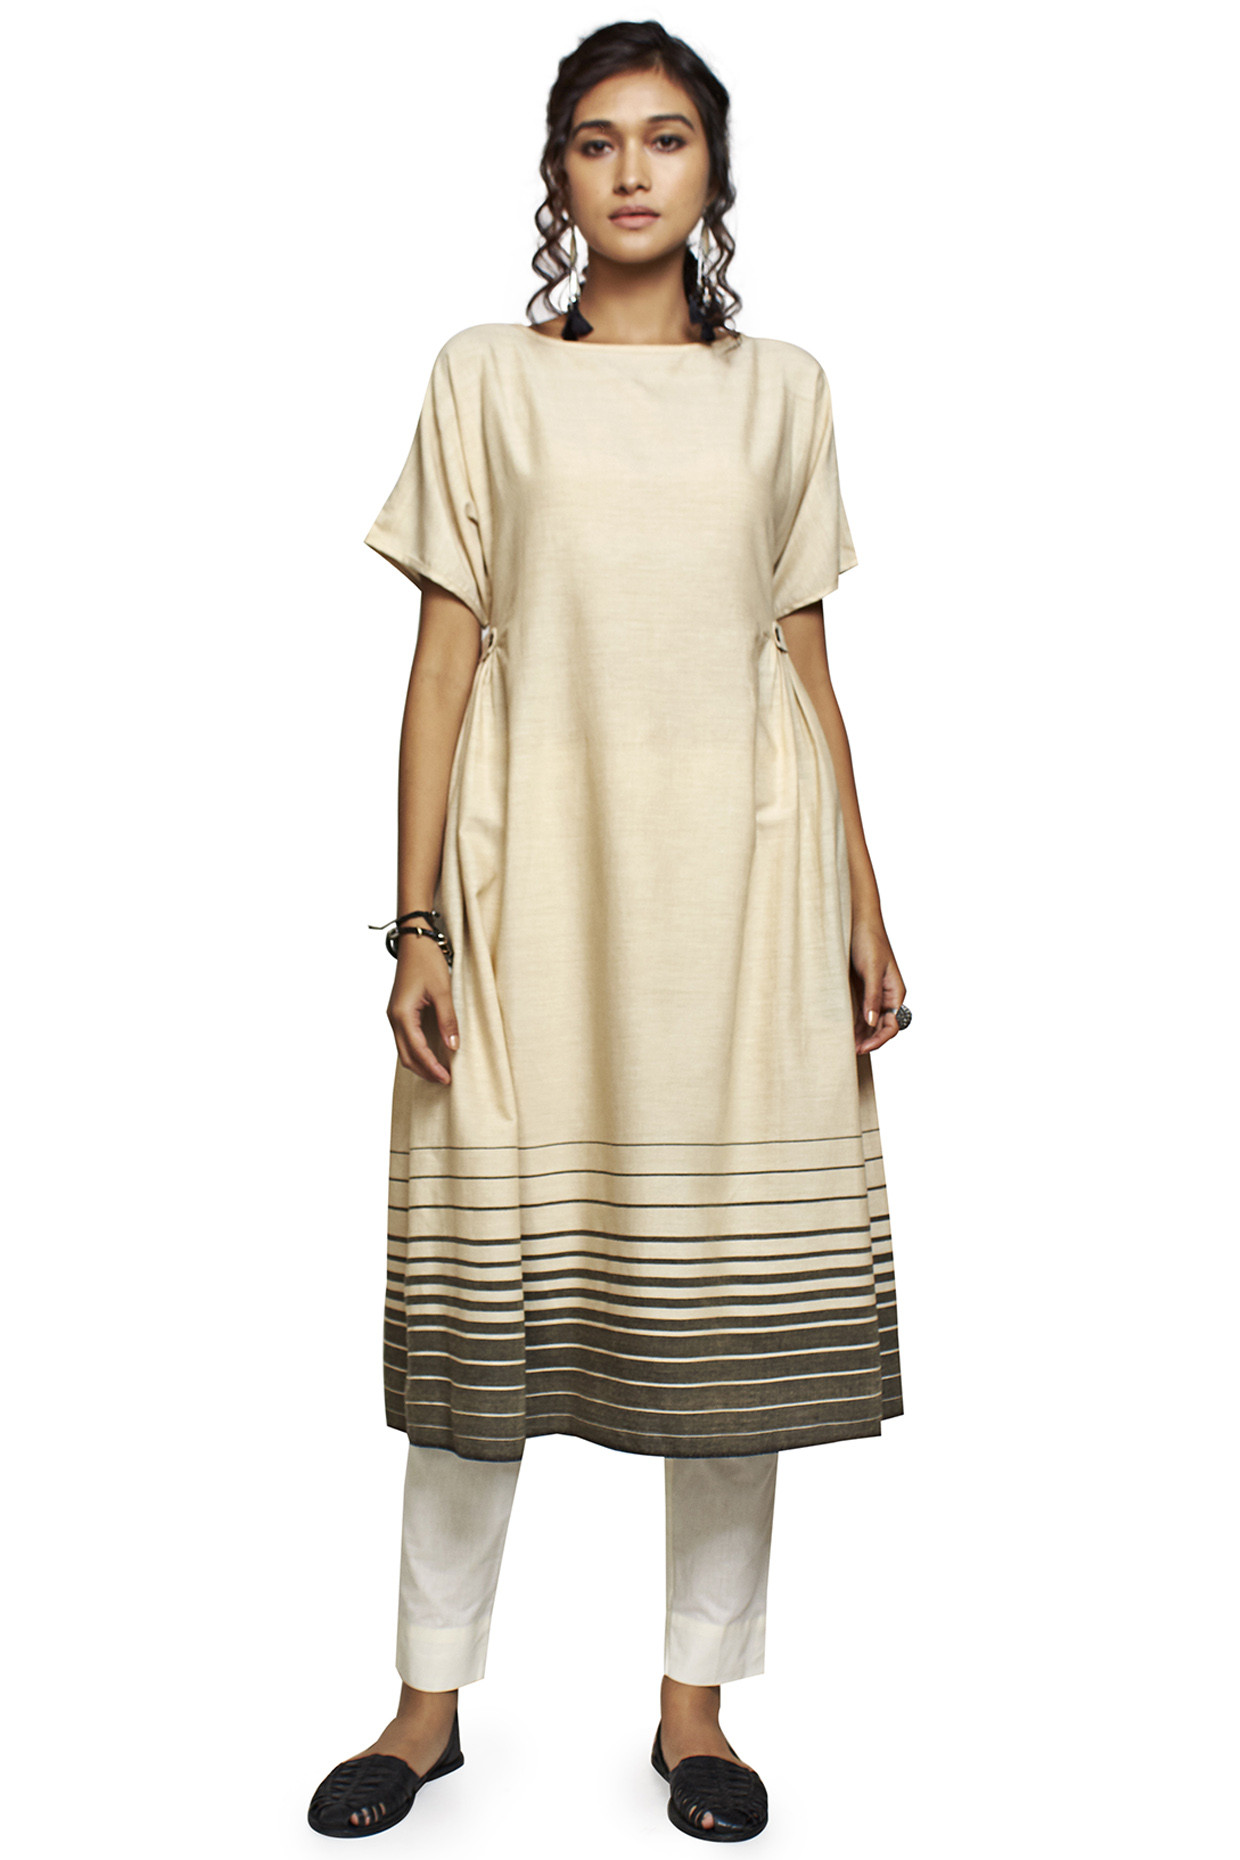 Silhouetted Beige Handloom Cotton Kurta by House Of Idar